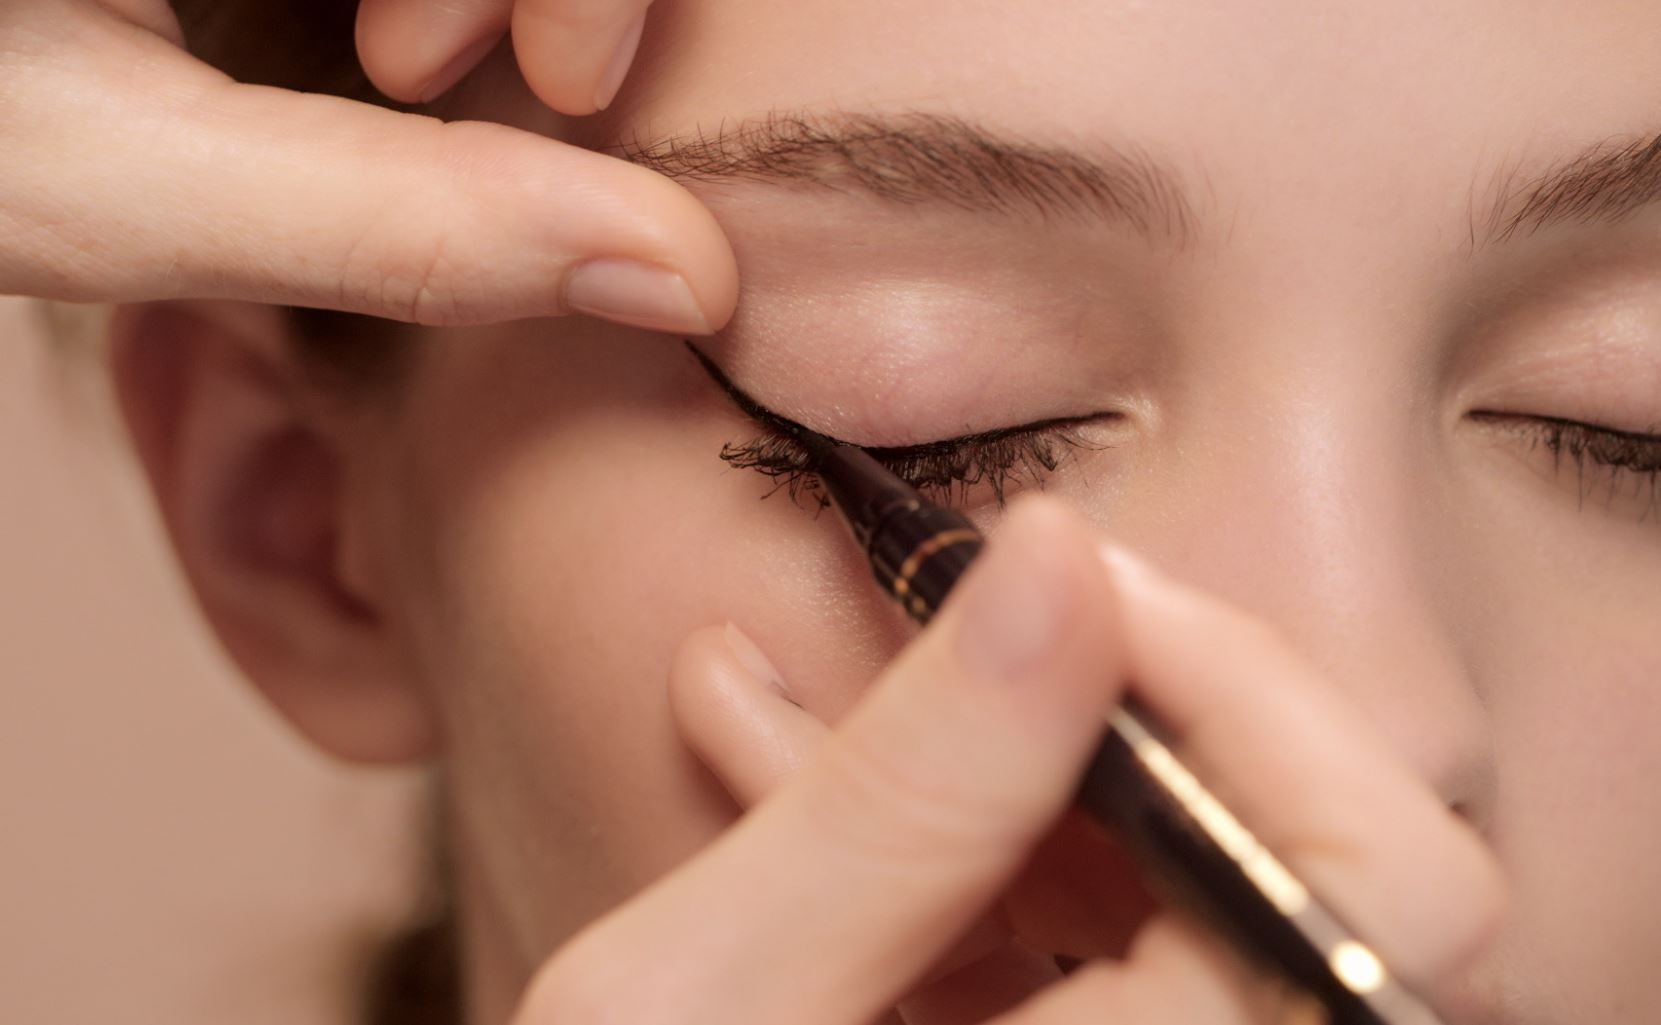 Master winged eyeliner with the latest episode of Vogue Beauty School - https://t.co/UkZh4pwaet https://t.co/aN6nJ9DFEy